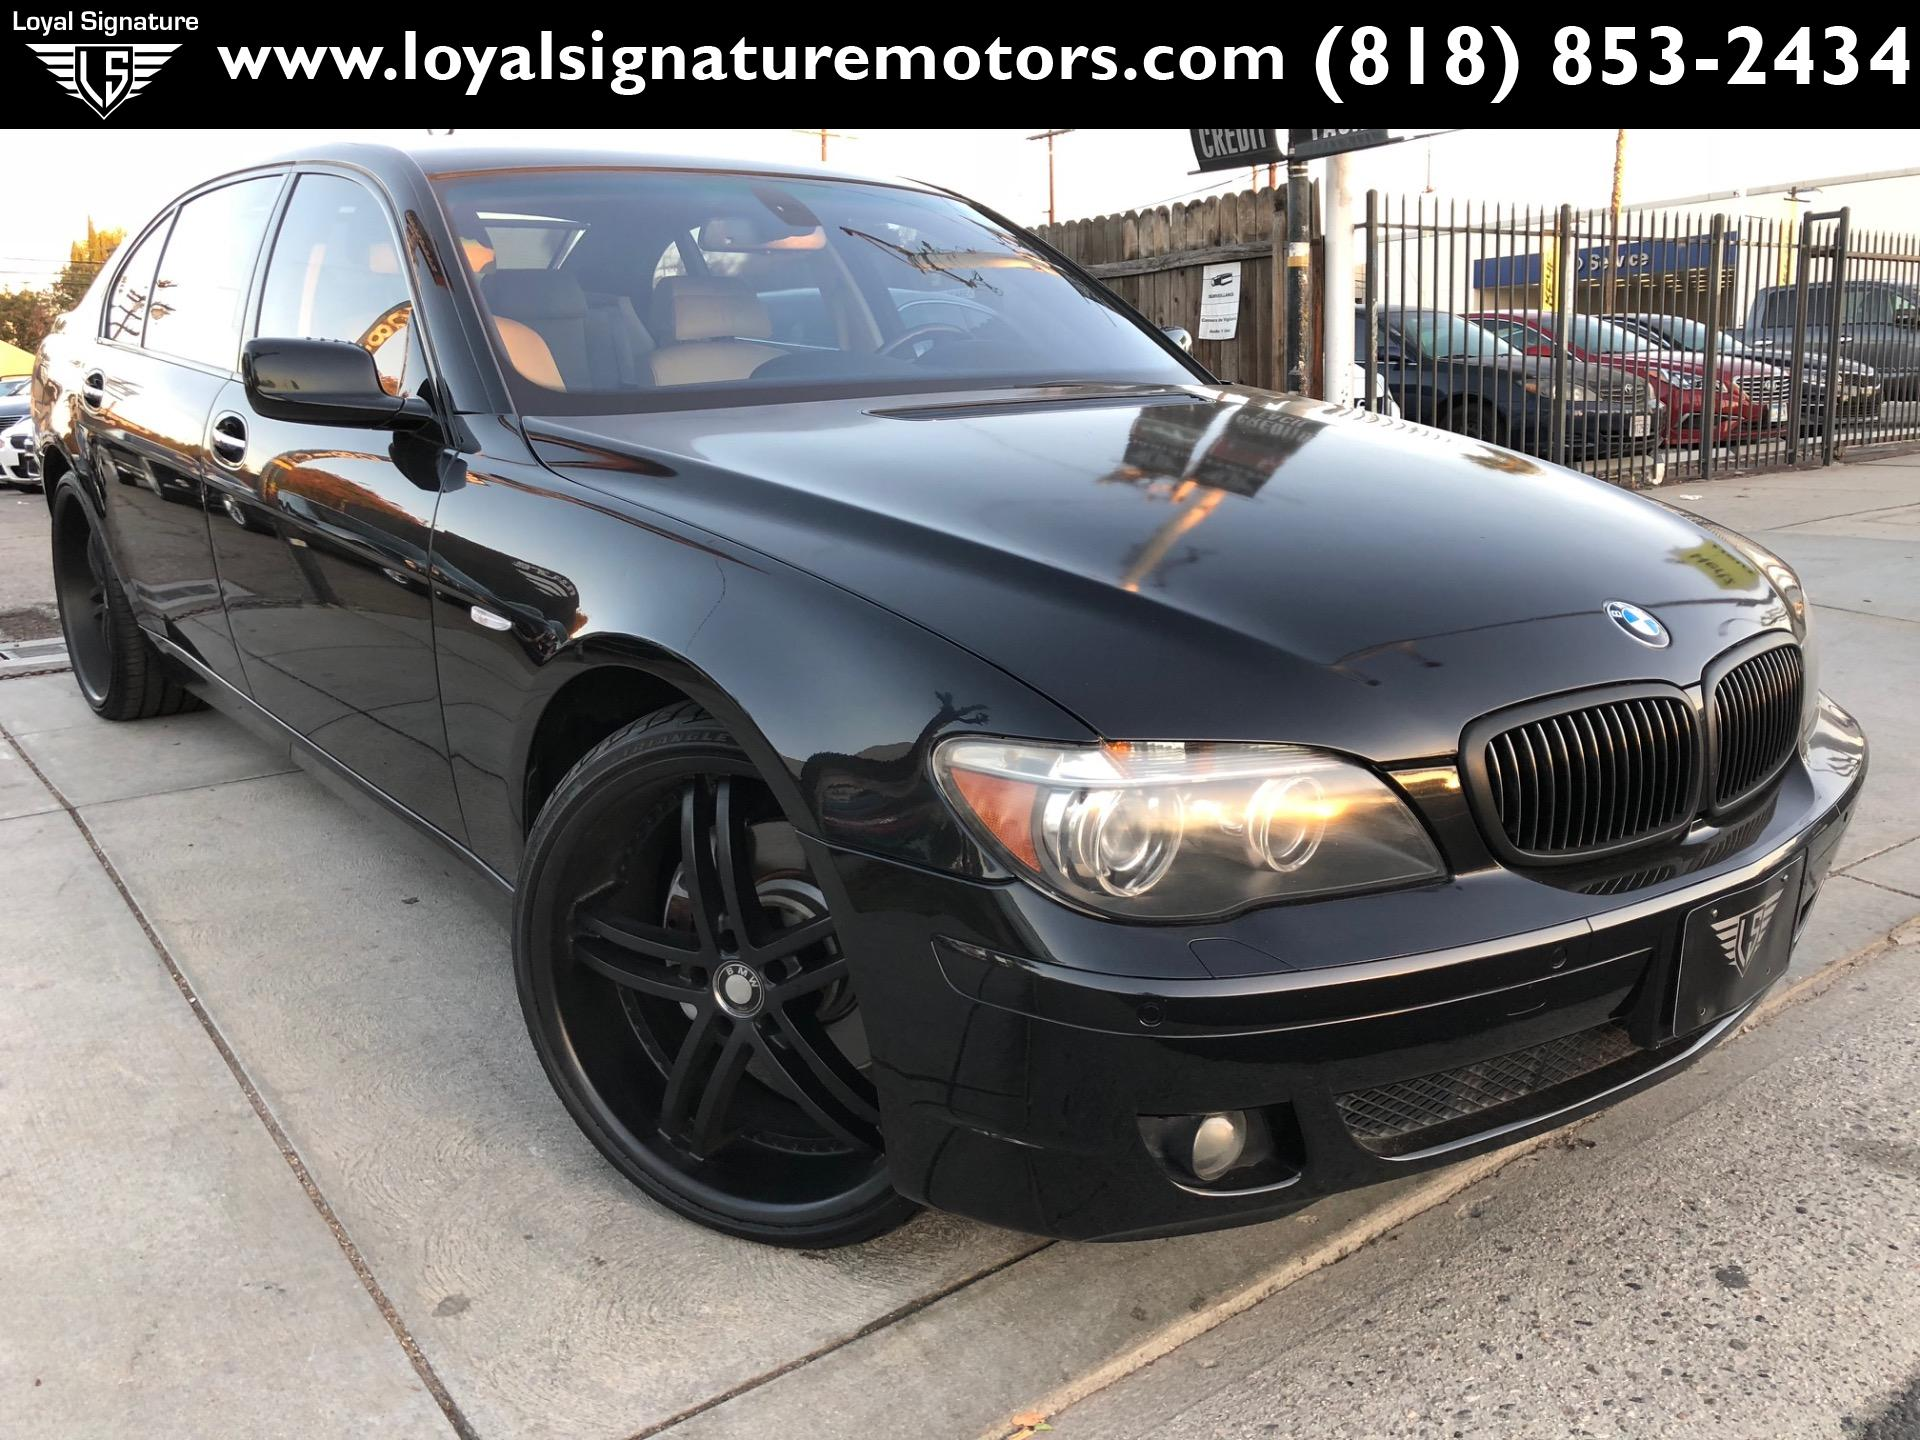 Used 2007 Bmw 7 Series 750li For Sale 5 995 Loyal Signature Motors Inc Stock 2018144